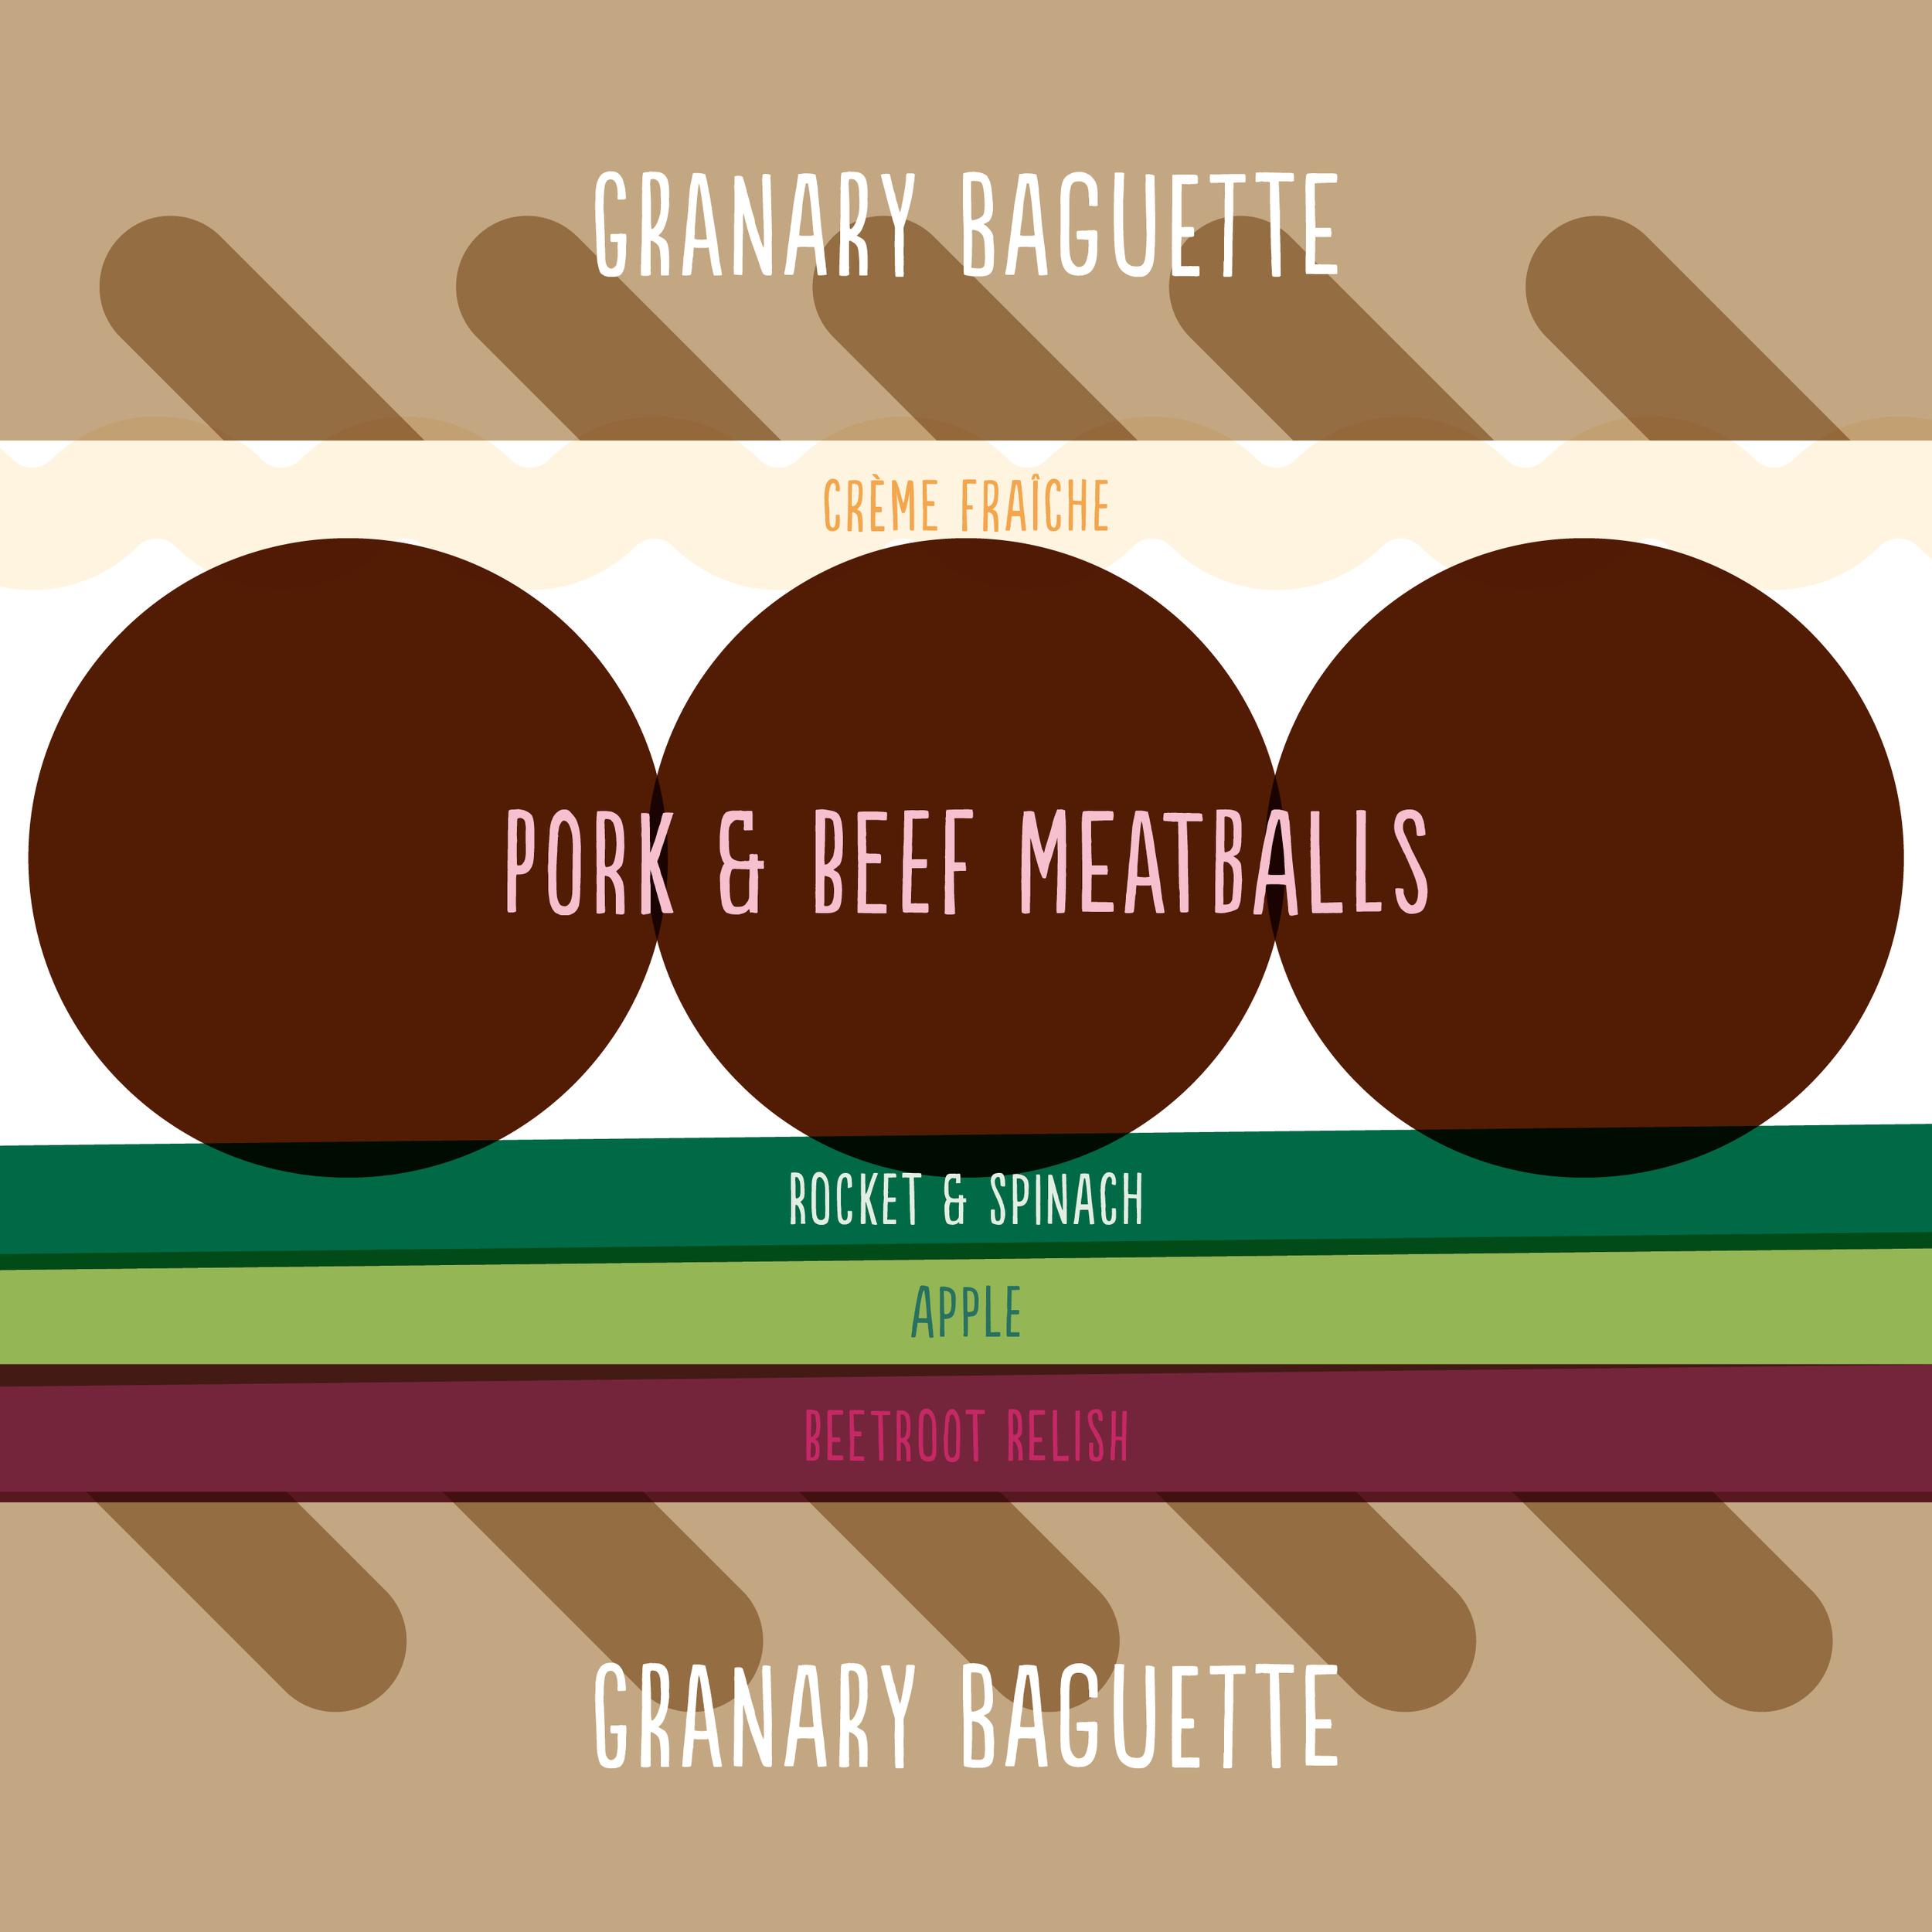 Meatballs-beetroot-relish-apple-creme-fraiche-baguette.jpg